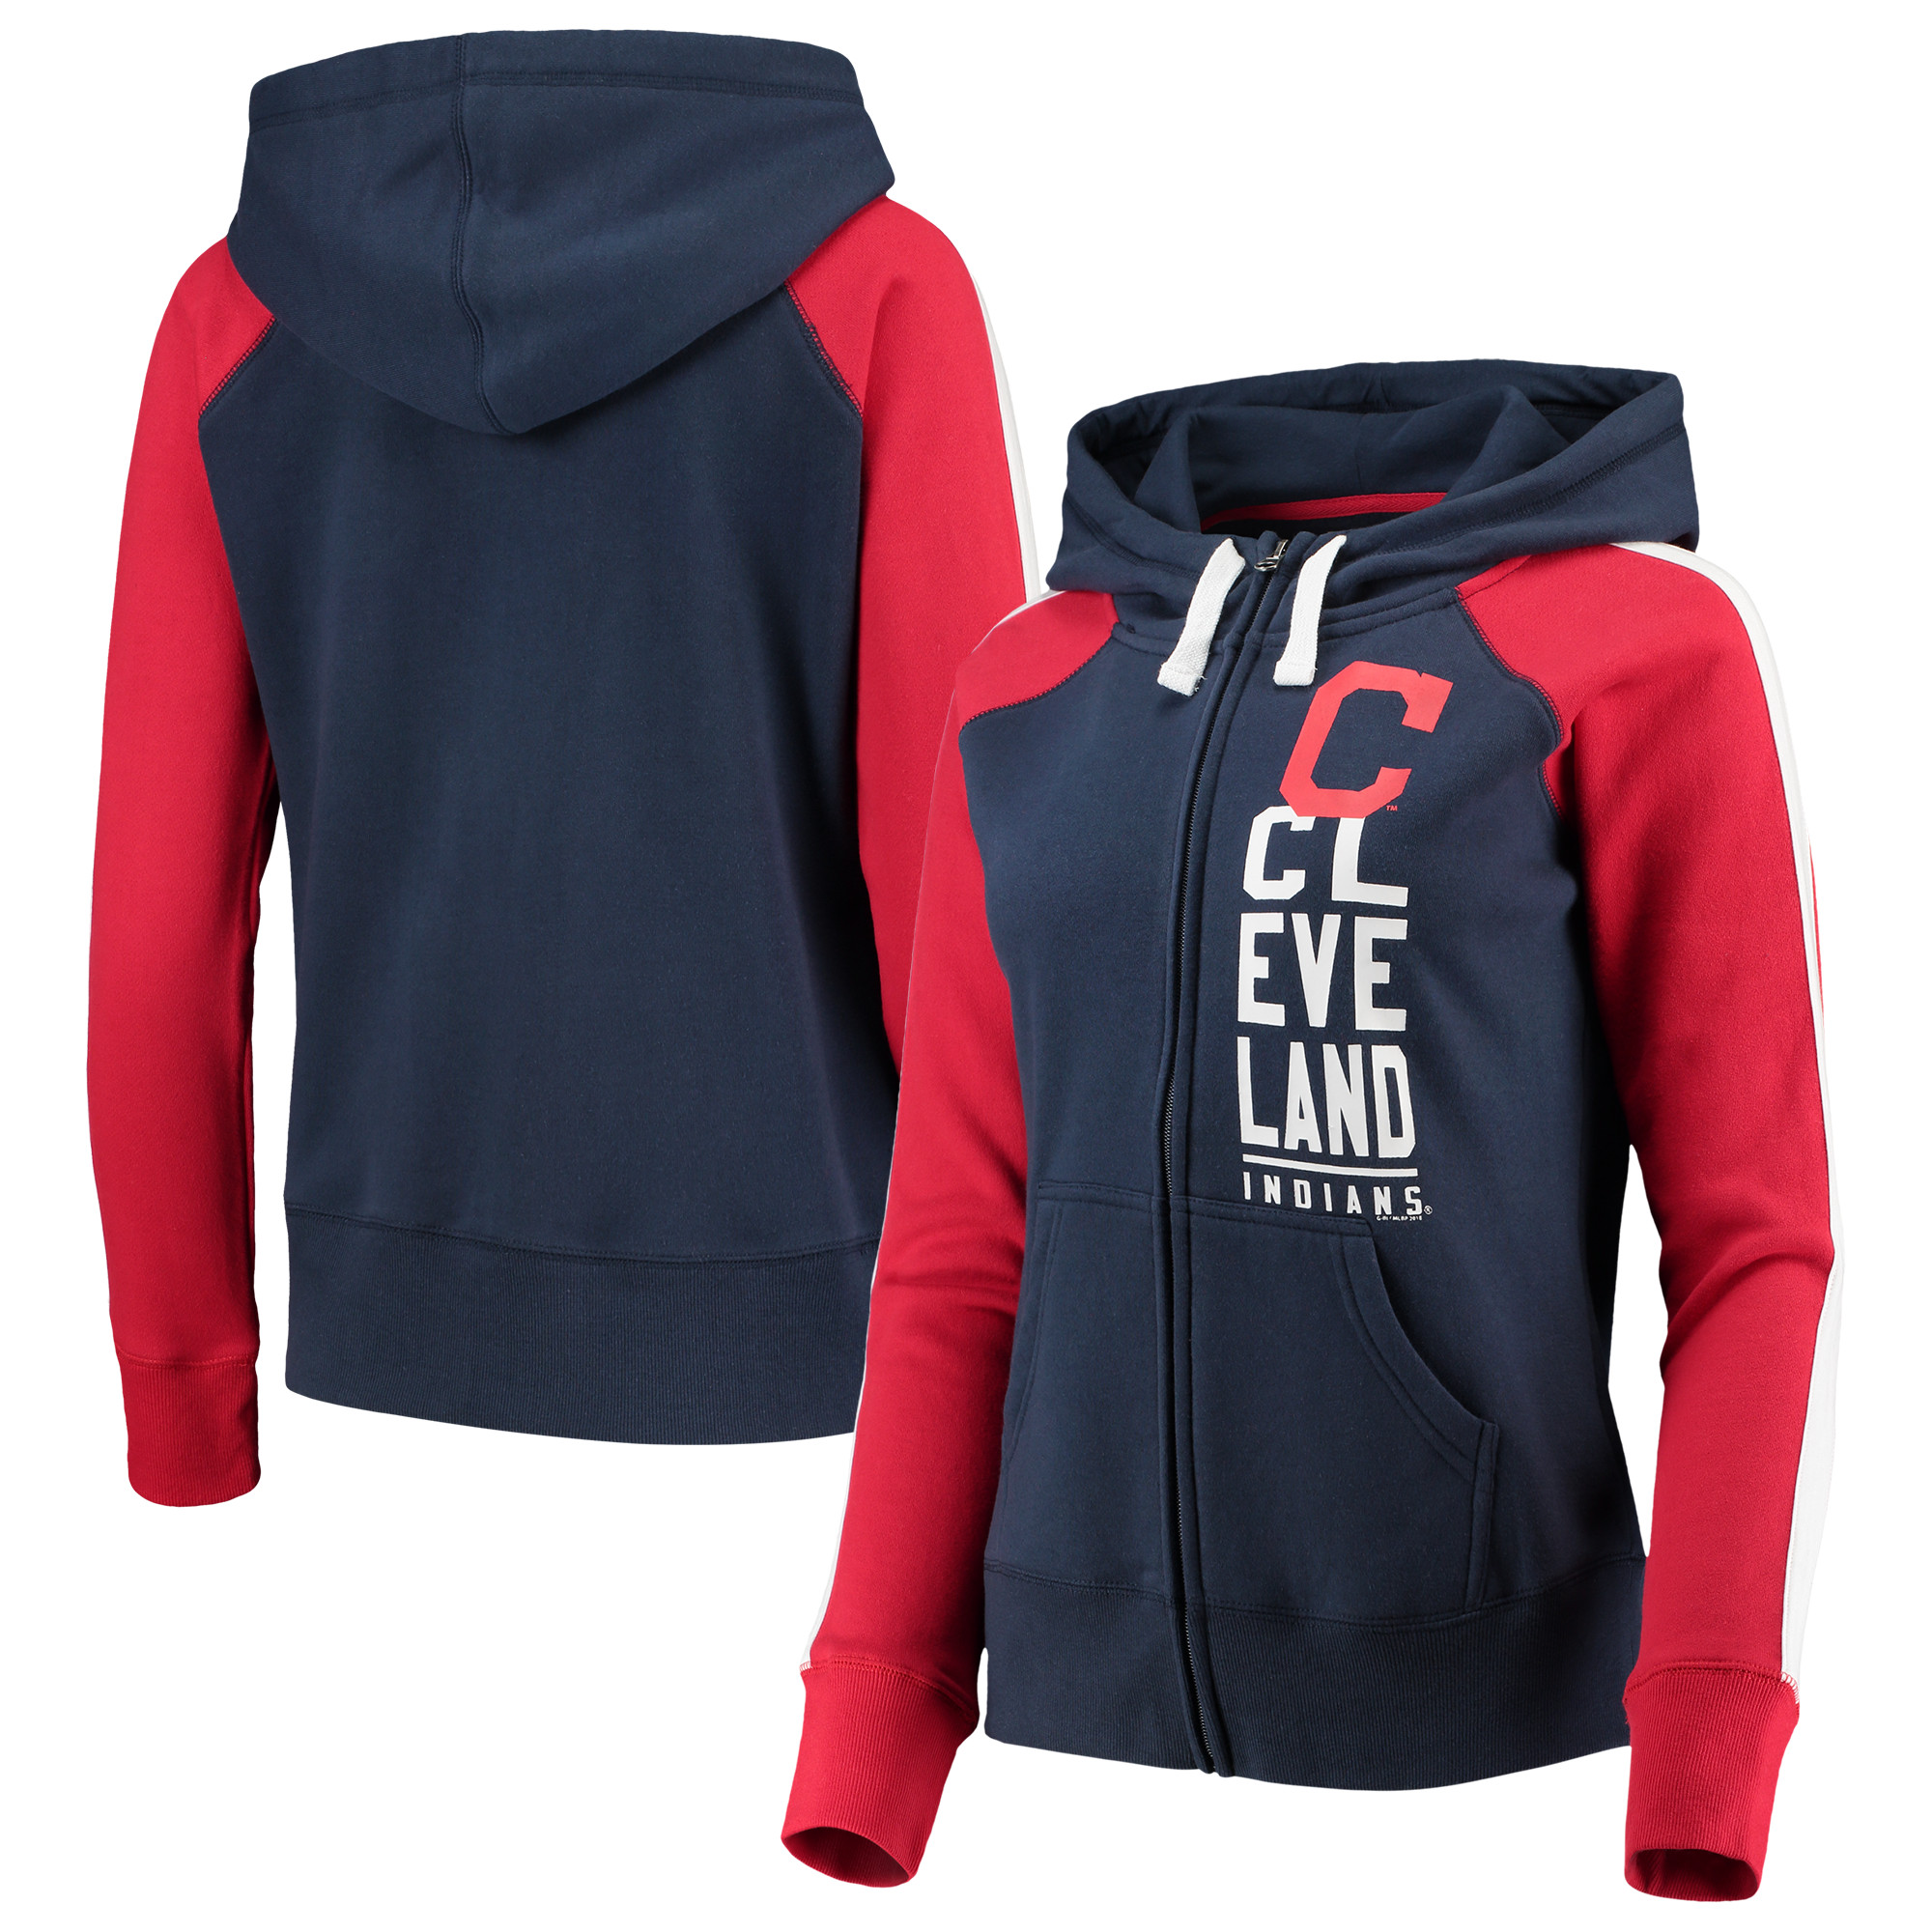 Cleveland Indians G-III 4Her by Carl Banks Women's Game Changer Raglan Full-Zip Jacket - Navy/Red